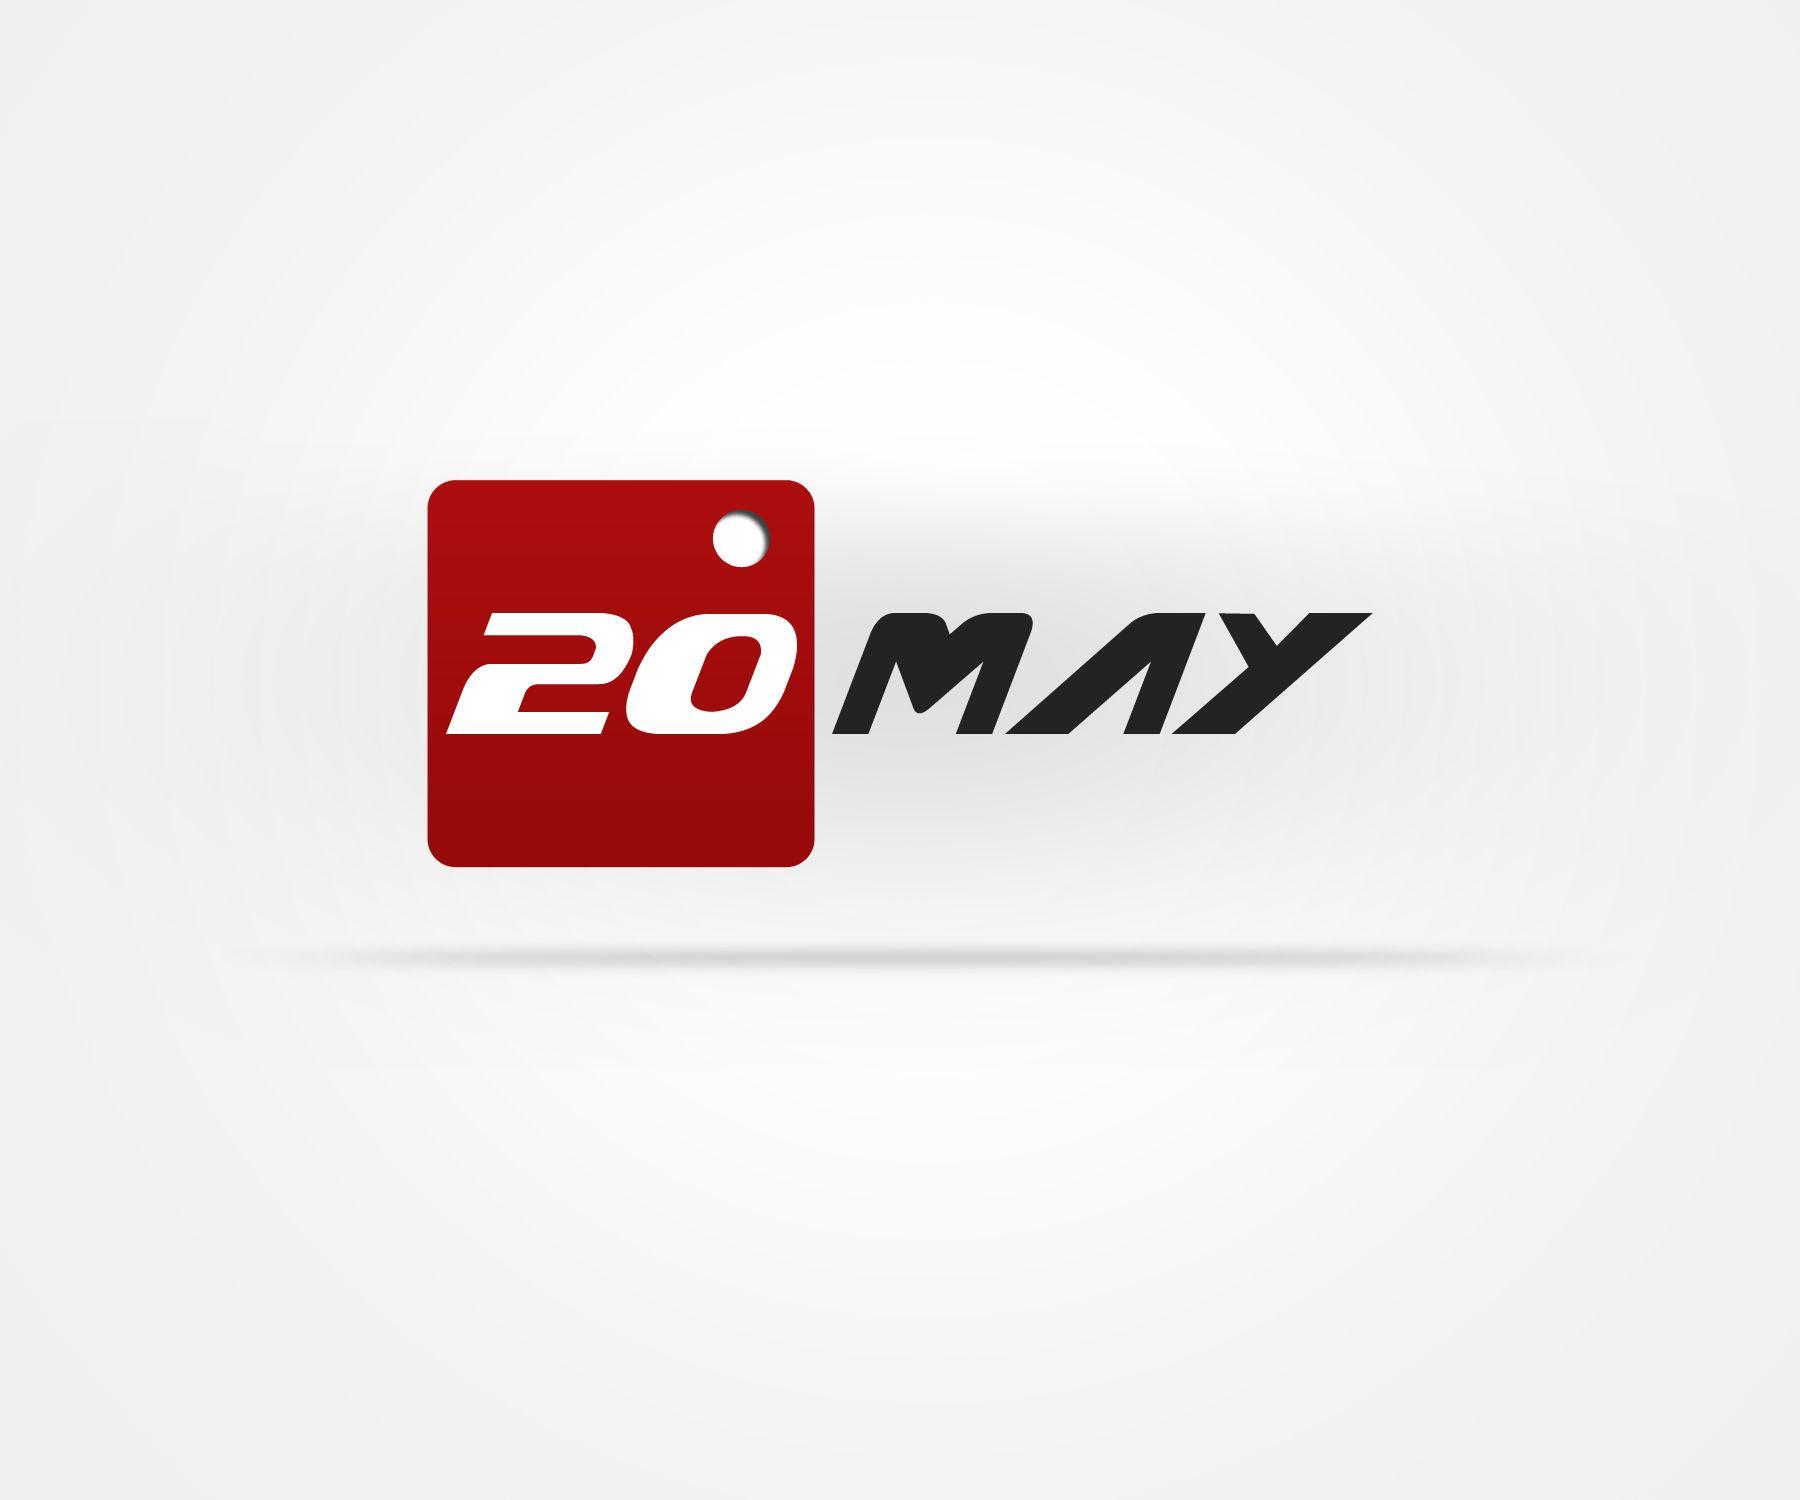 20MAY Project - дизайнер bonvian